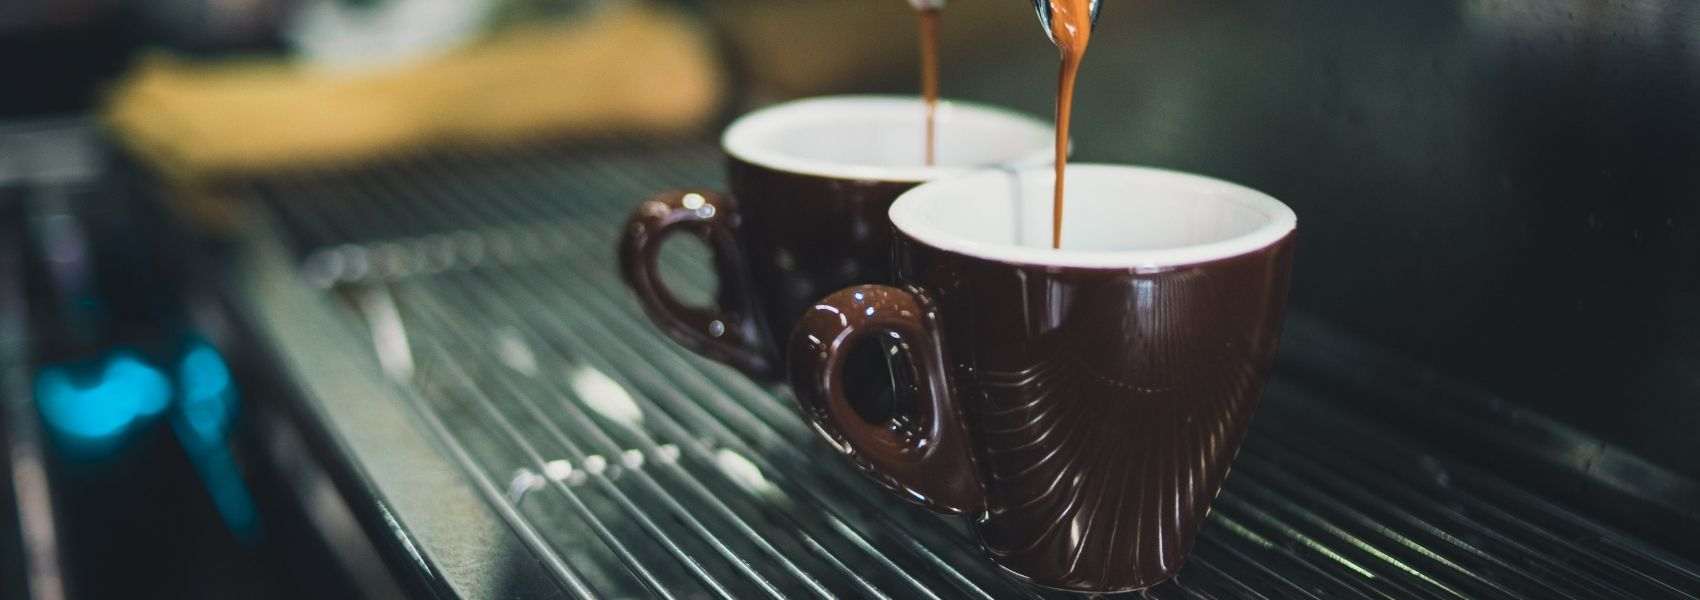 café agrava a ansiedade